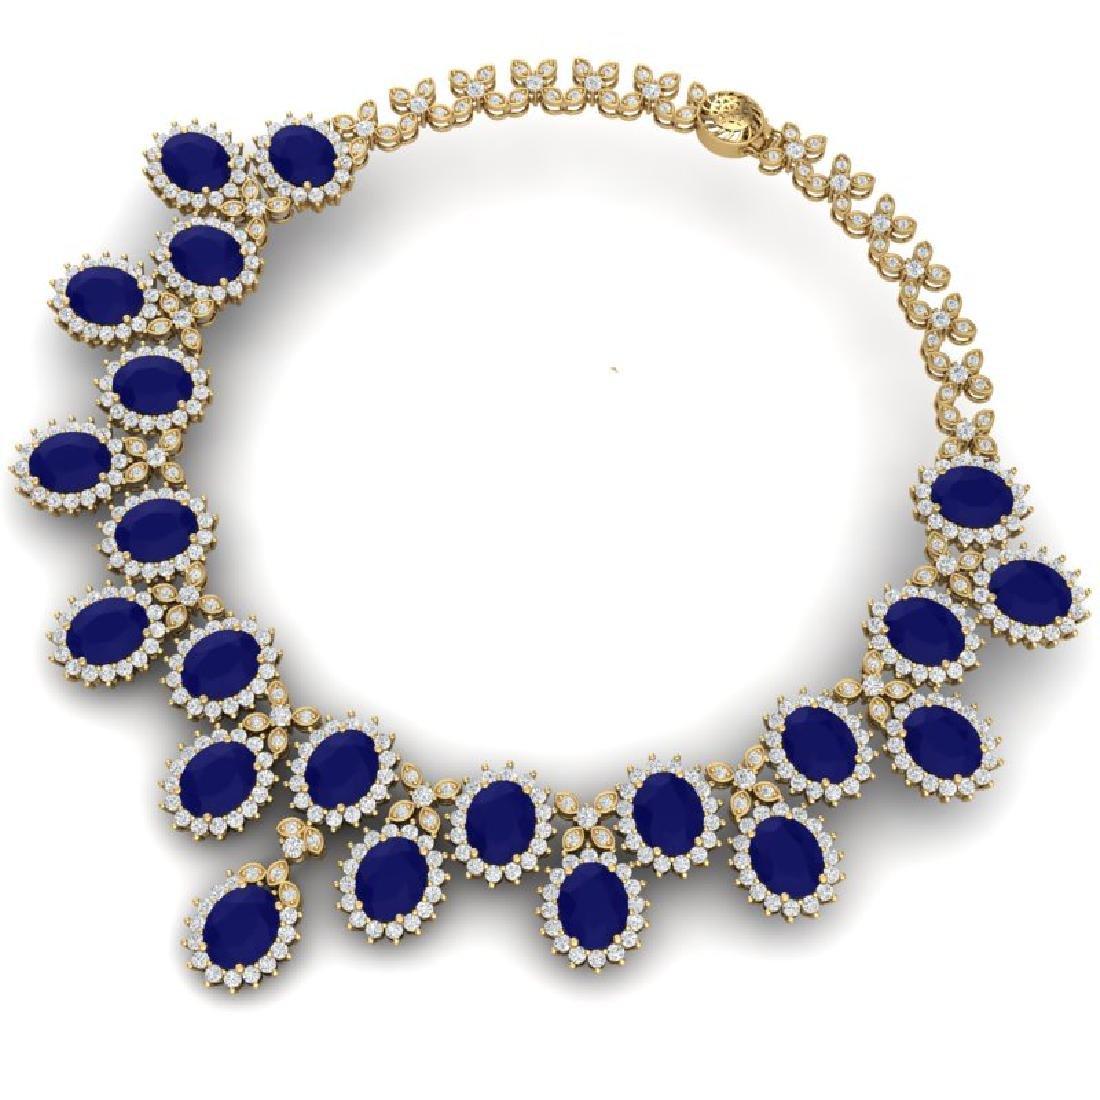 81 CTW Royalty Sapphire & VS Diamond Necklace 18K - 3